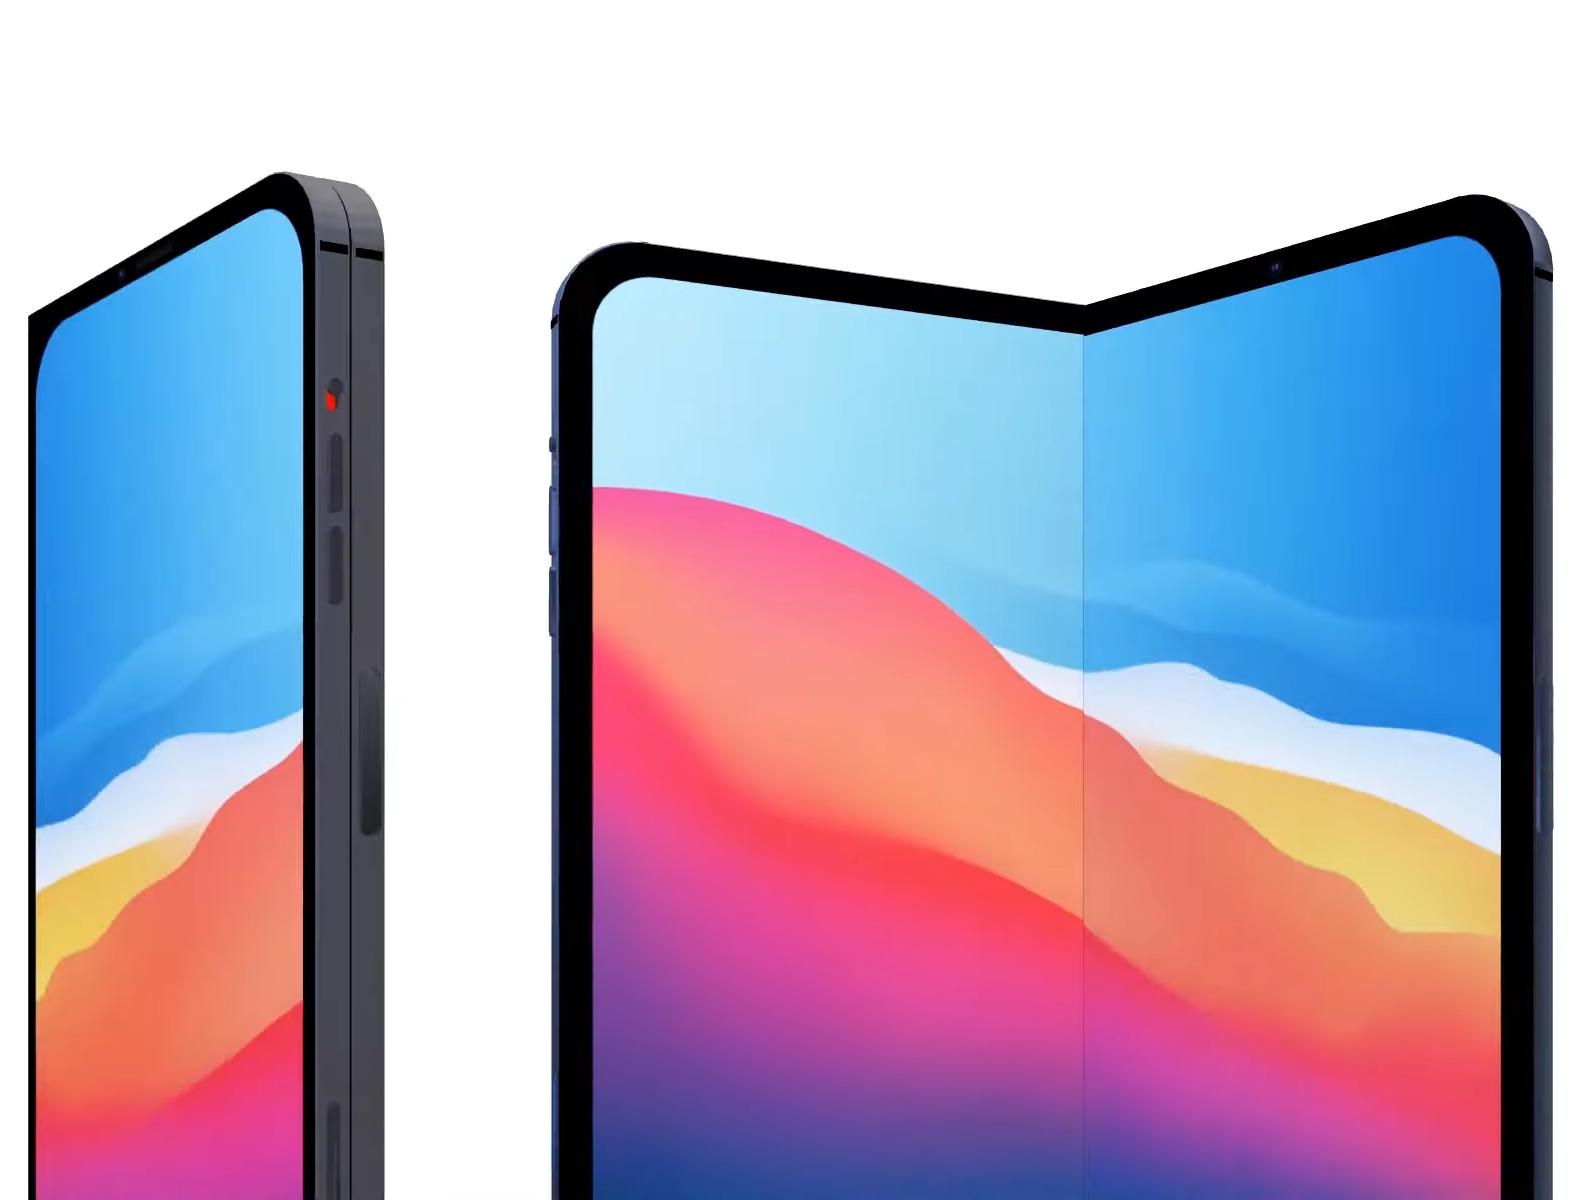 iPhone Fold โผล่เป็นคลิปแรนเดอร์ มาพร้อมสเปคสุดเจ๋ง